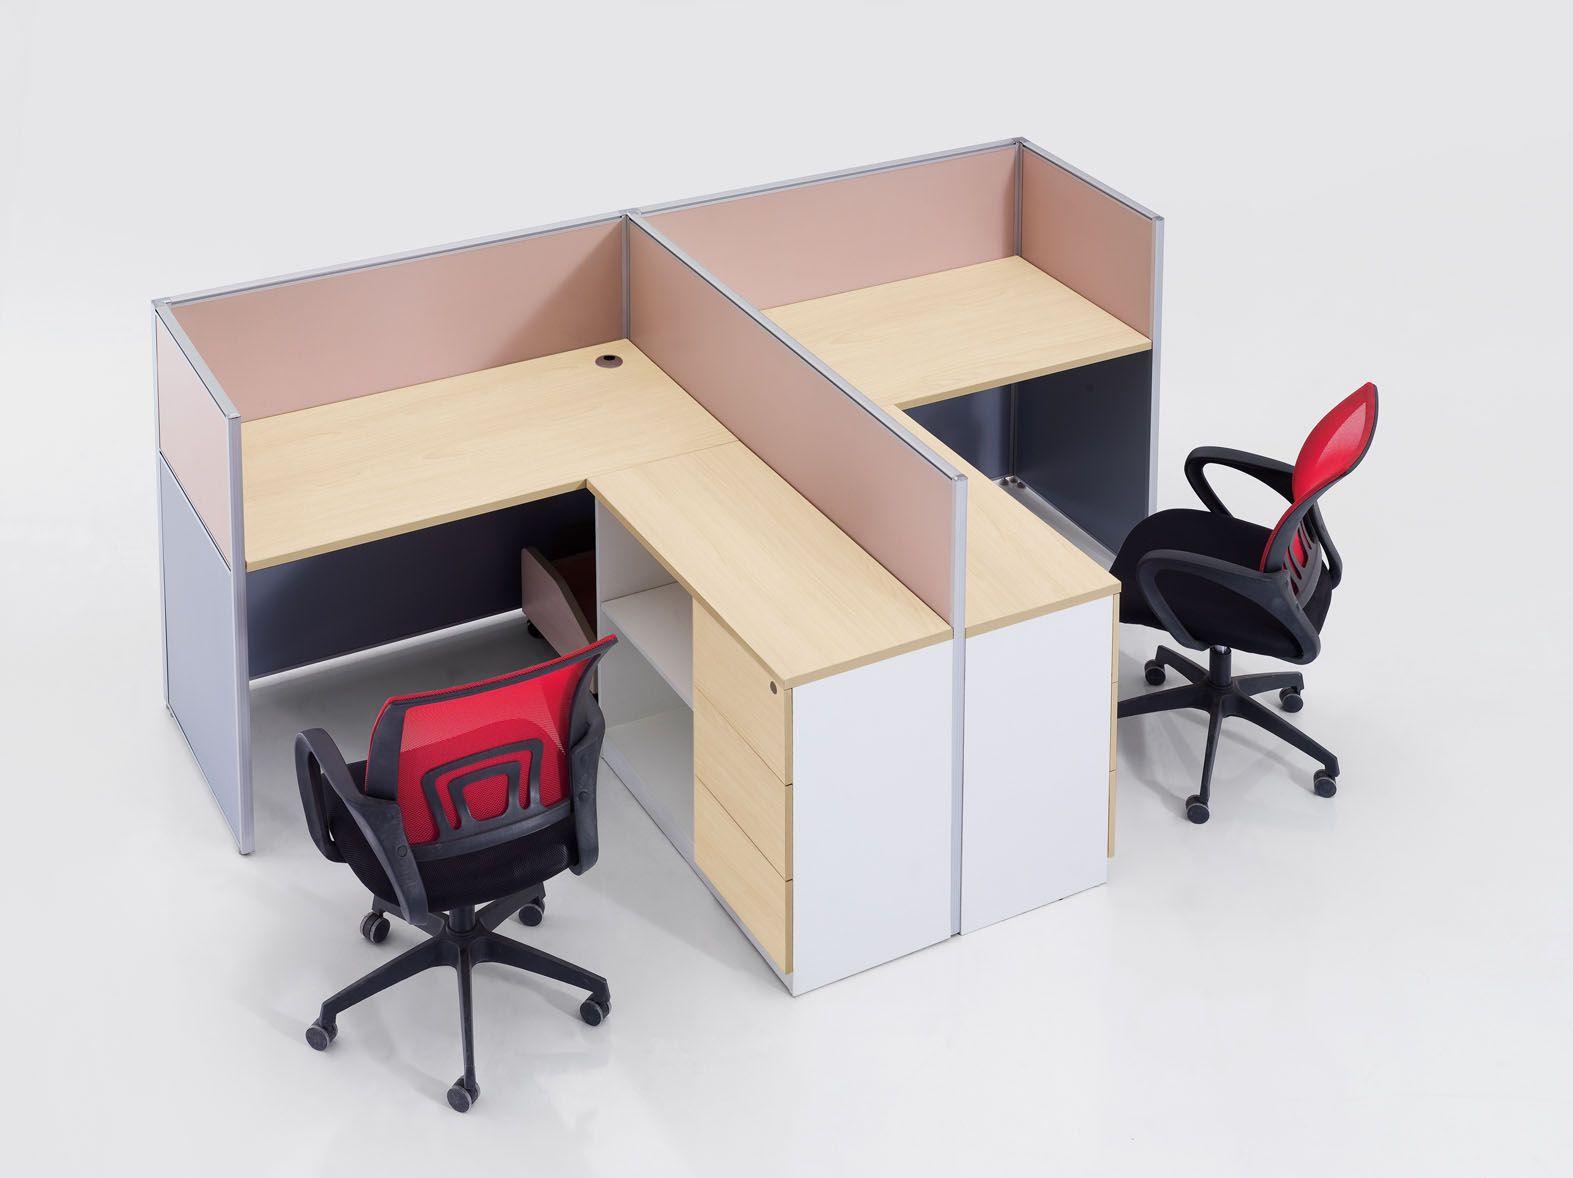 Cd60 Series Modular Workstation Cd60 G007 Jpg 1573 1178 Office Furniture Uk Office Desk For Sale Executive Office Desk